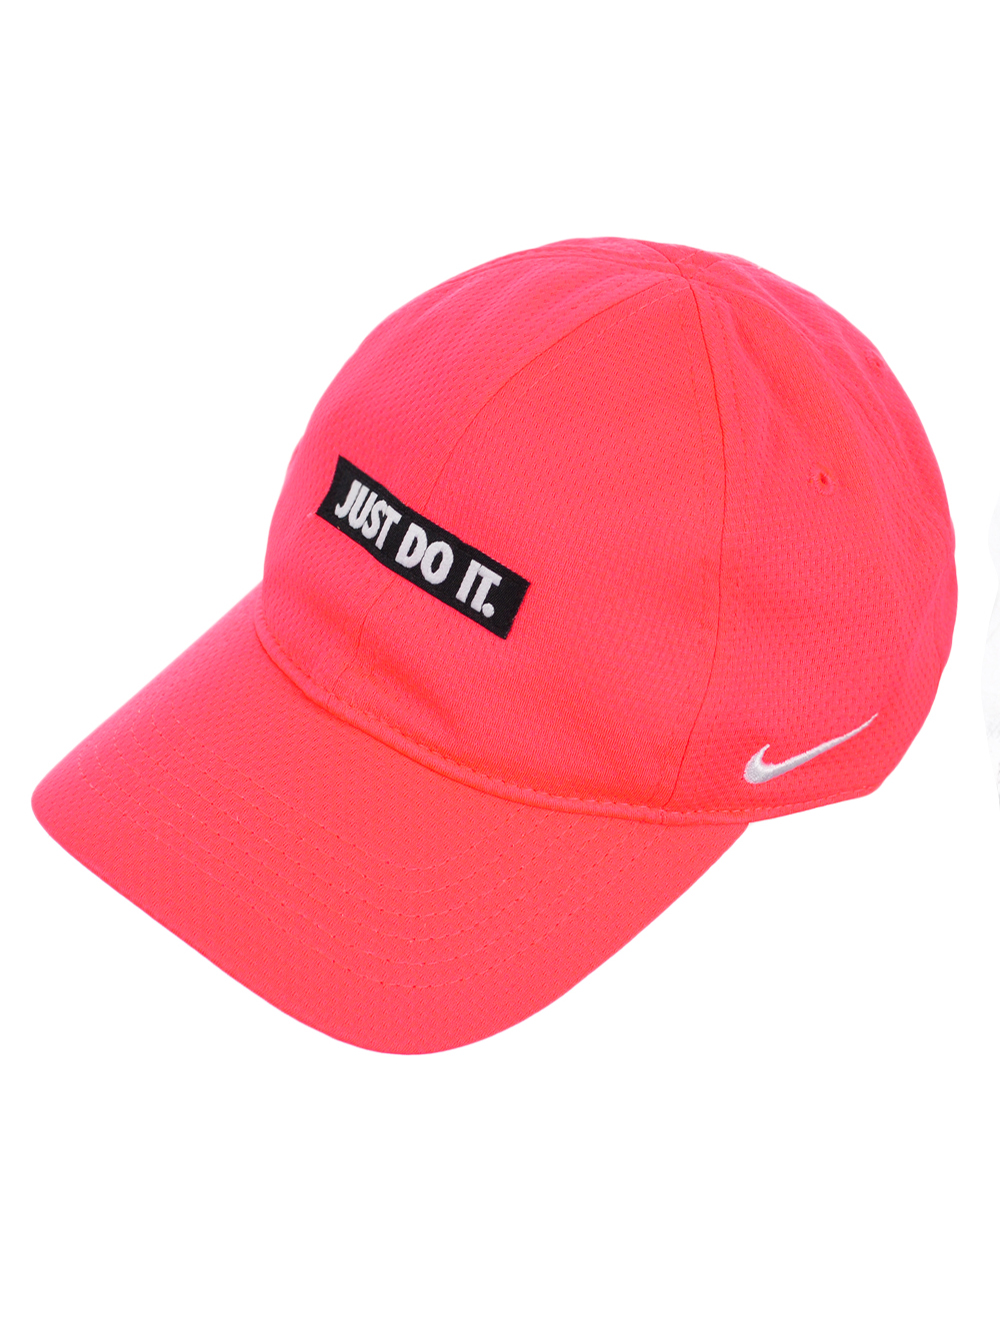 Nike Nike Girls  Baseball Cap (Youth One Size) alternate image 944b7222ca1